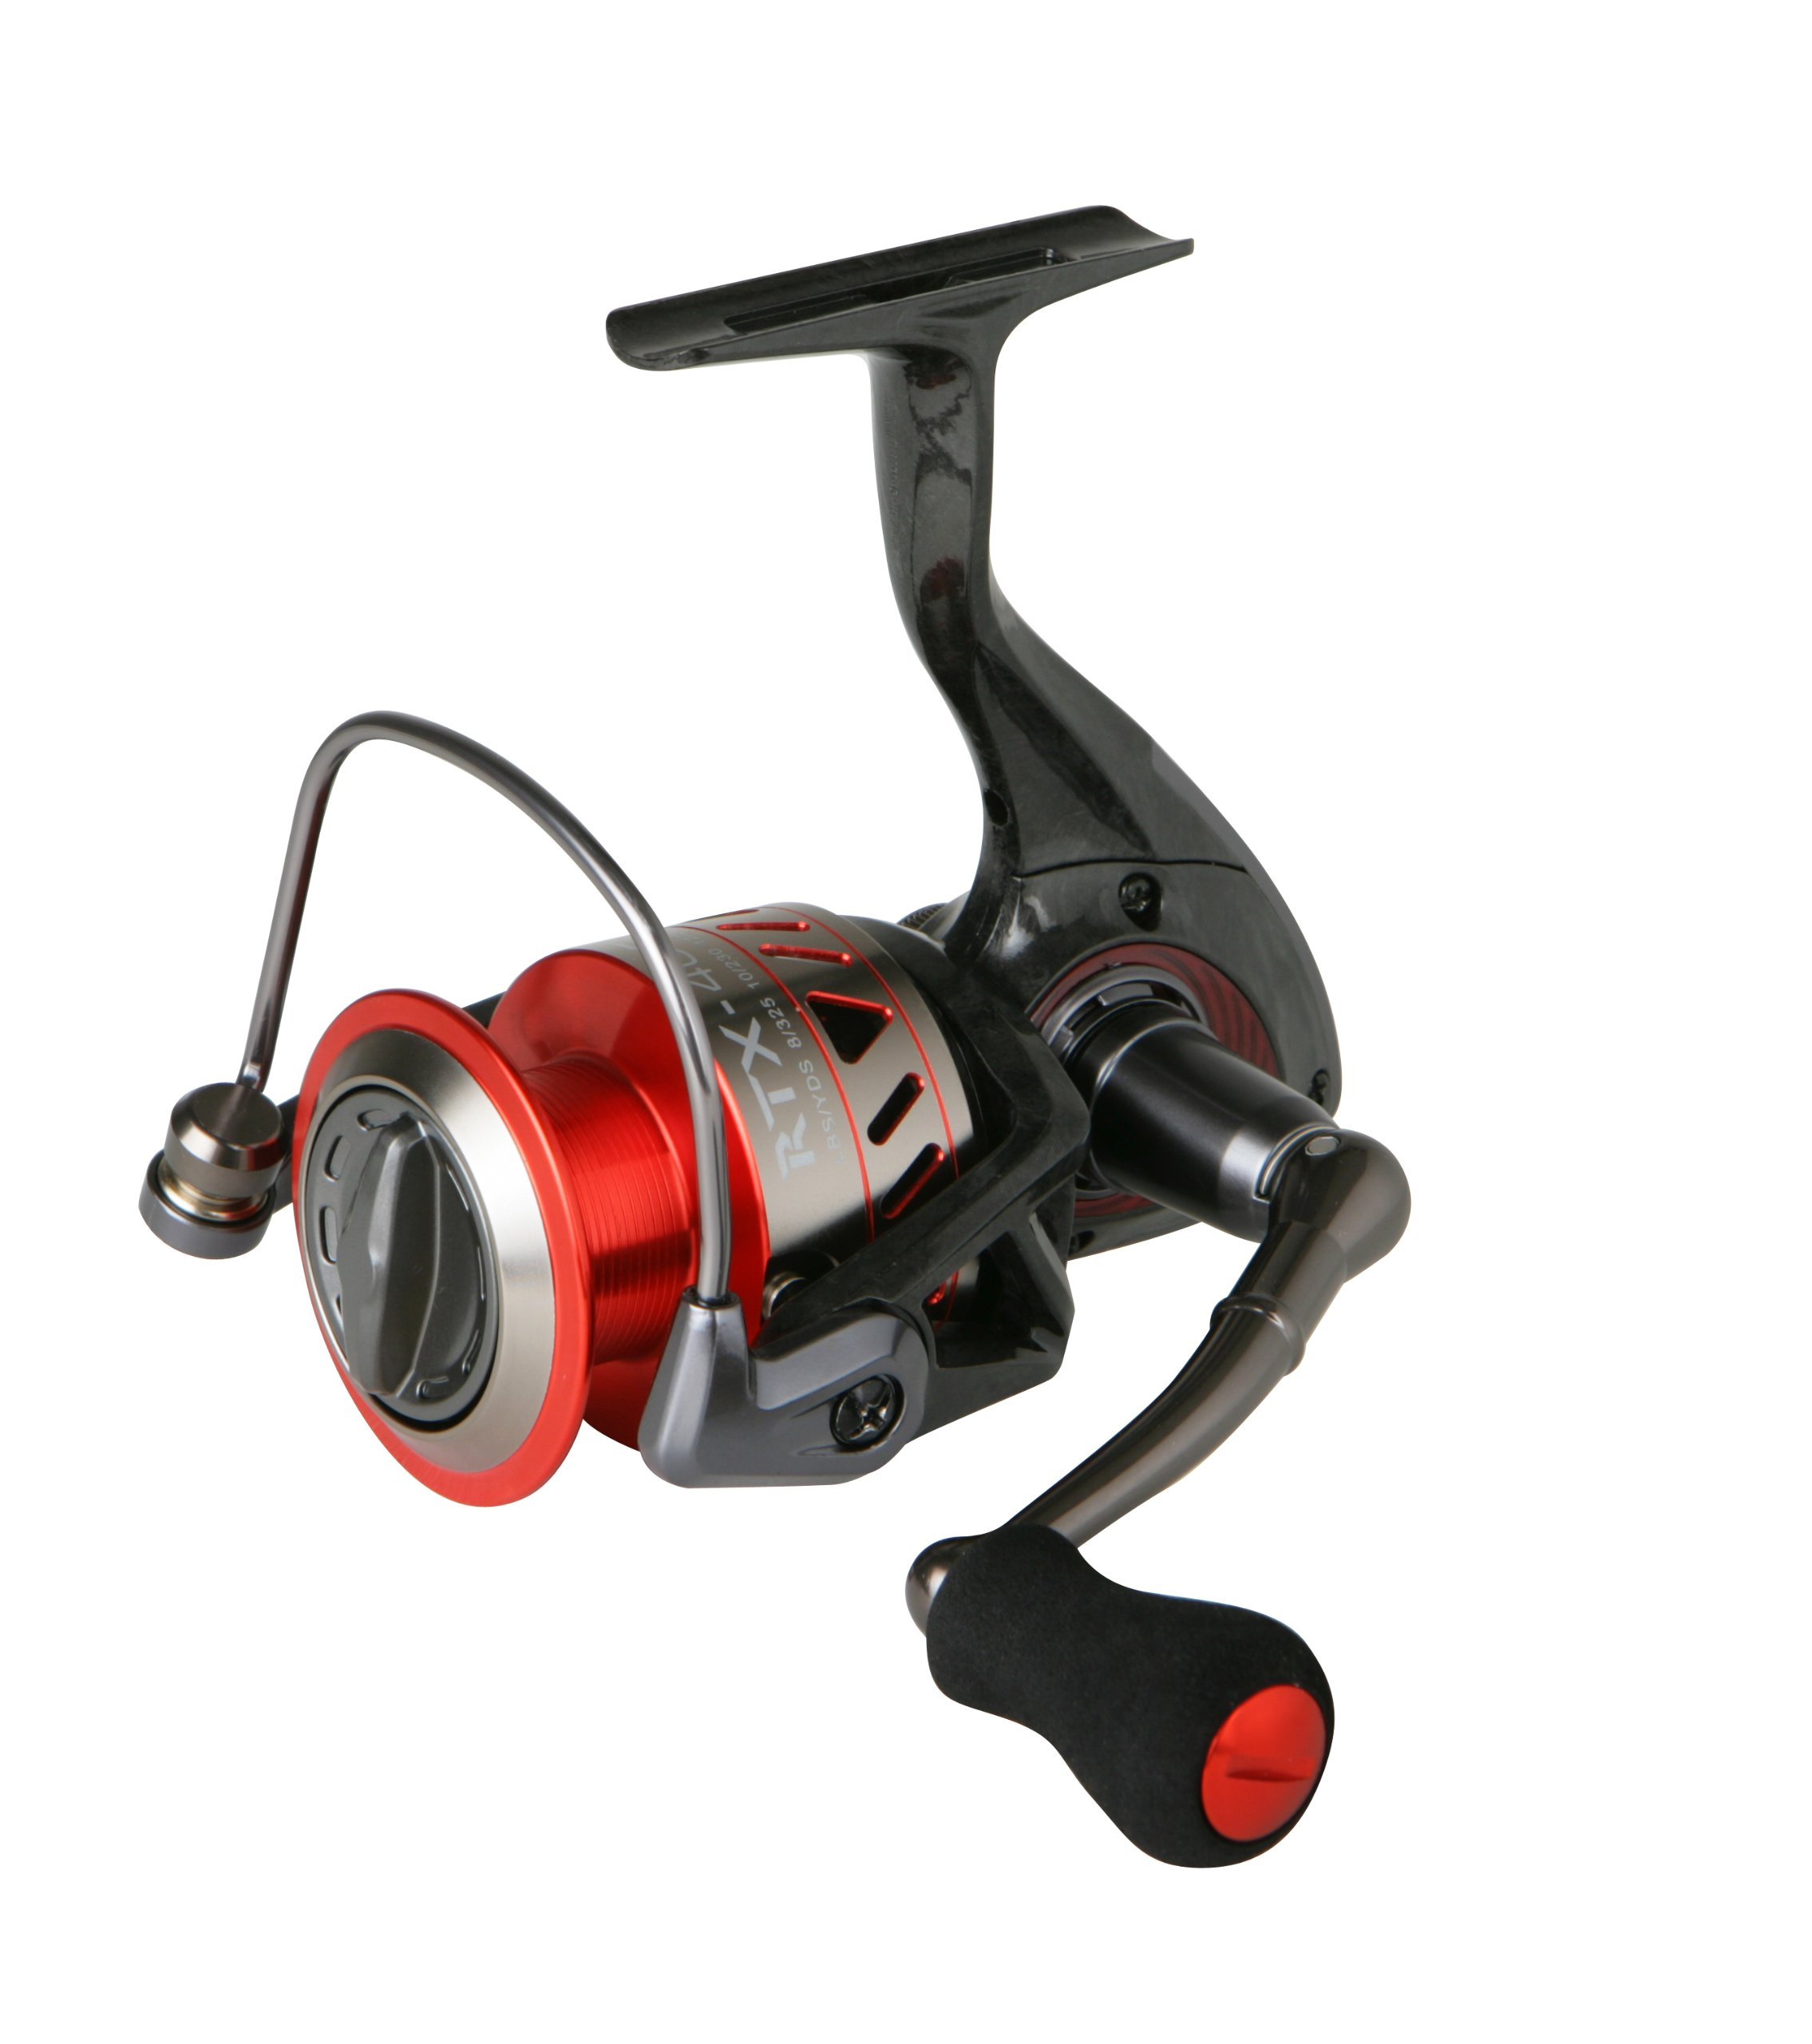 Okuma RTX 30S Extremely Lightweight Spinning